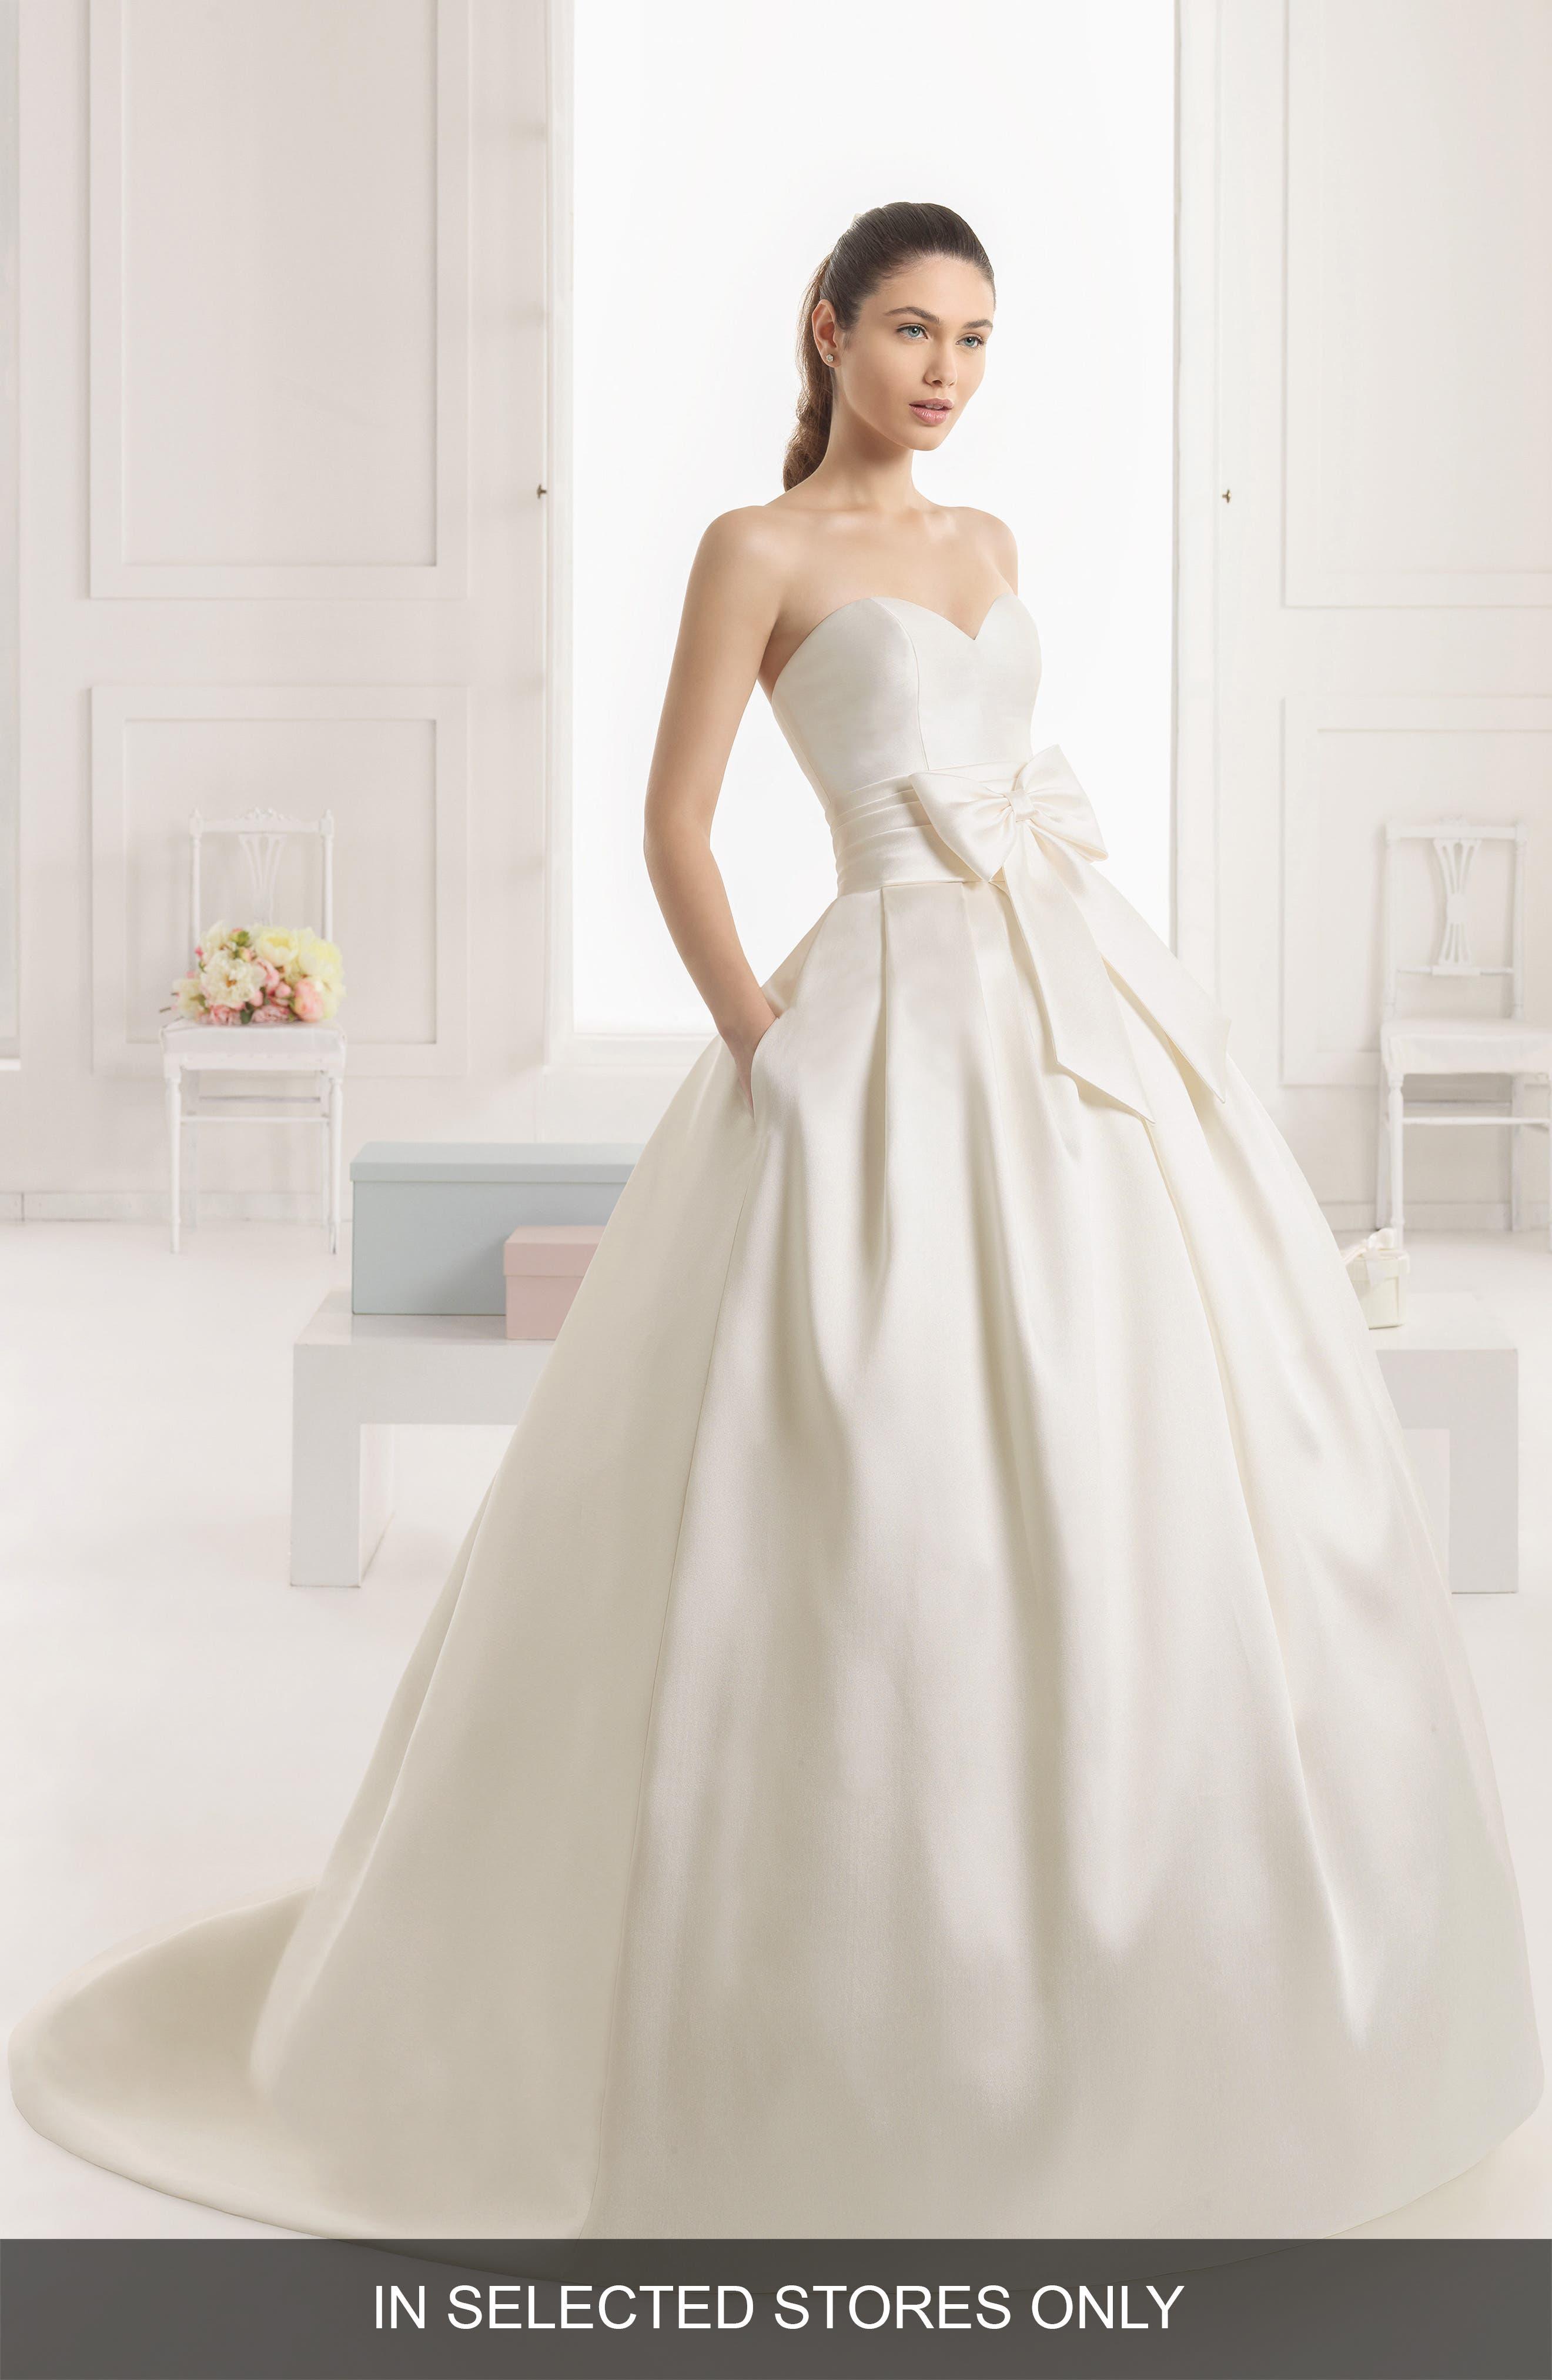 Main Image - Rosa Clara Enebro Strapless Bow Ballgown Dress